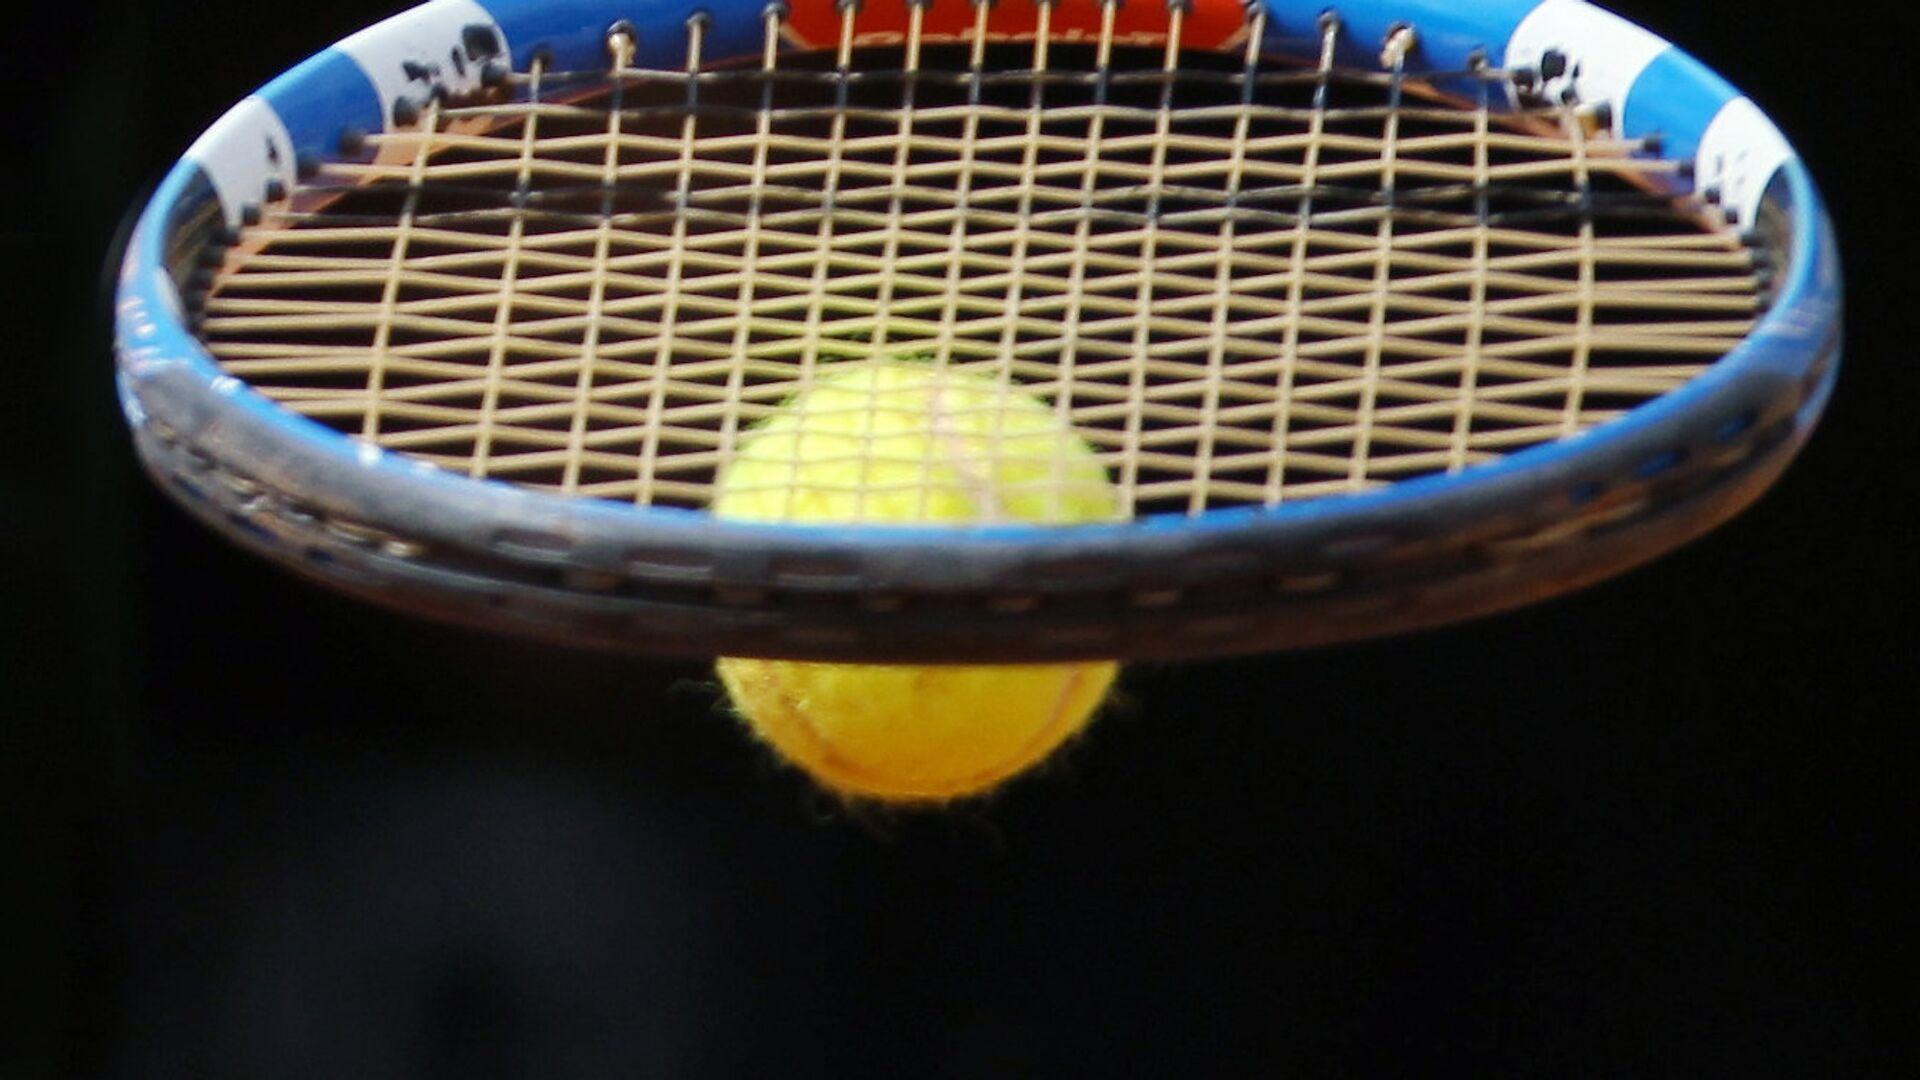 Теннисная ракетка, архивное фото - Sputnik Беларусь, 1920, 04.10.2021